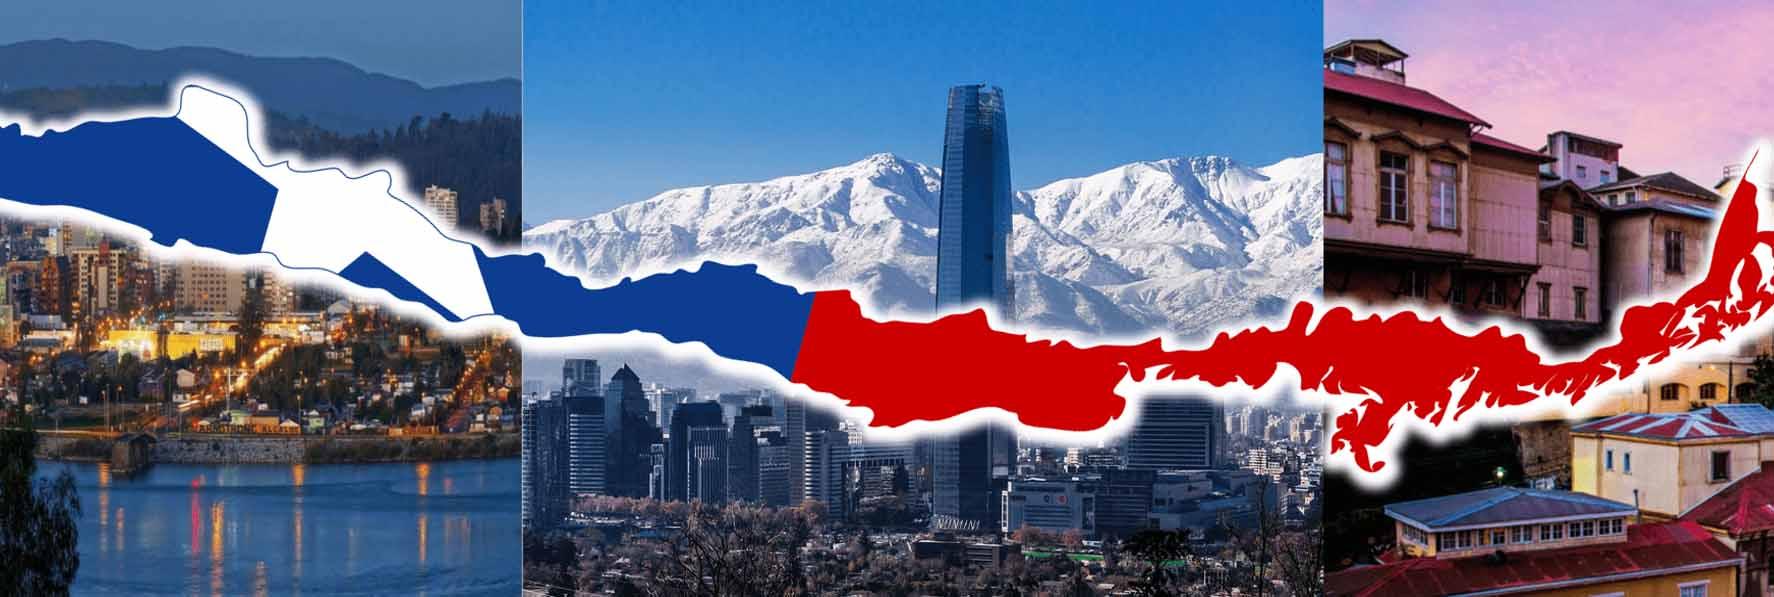 Chile-MaatChile-1.jpg